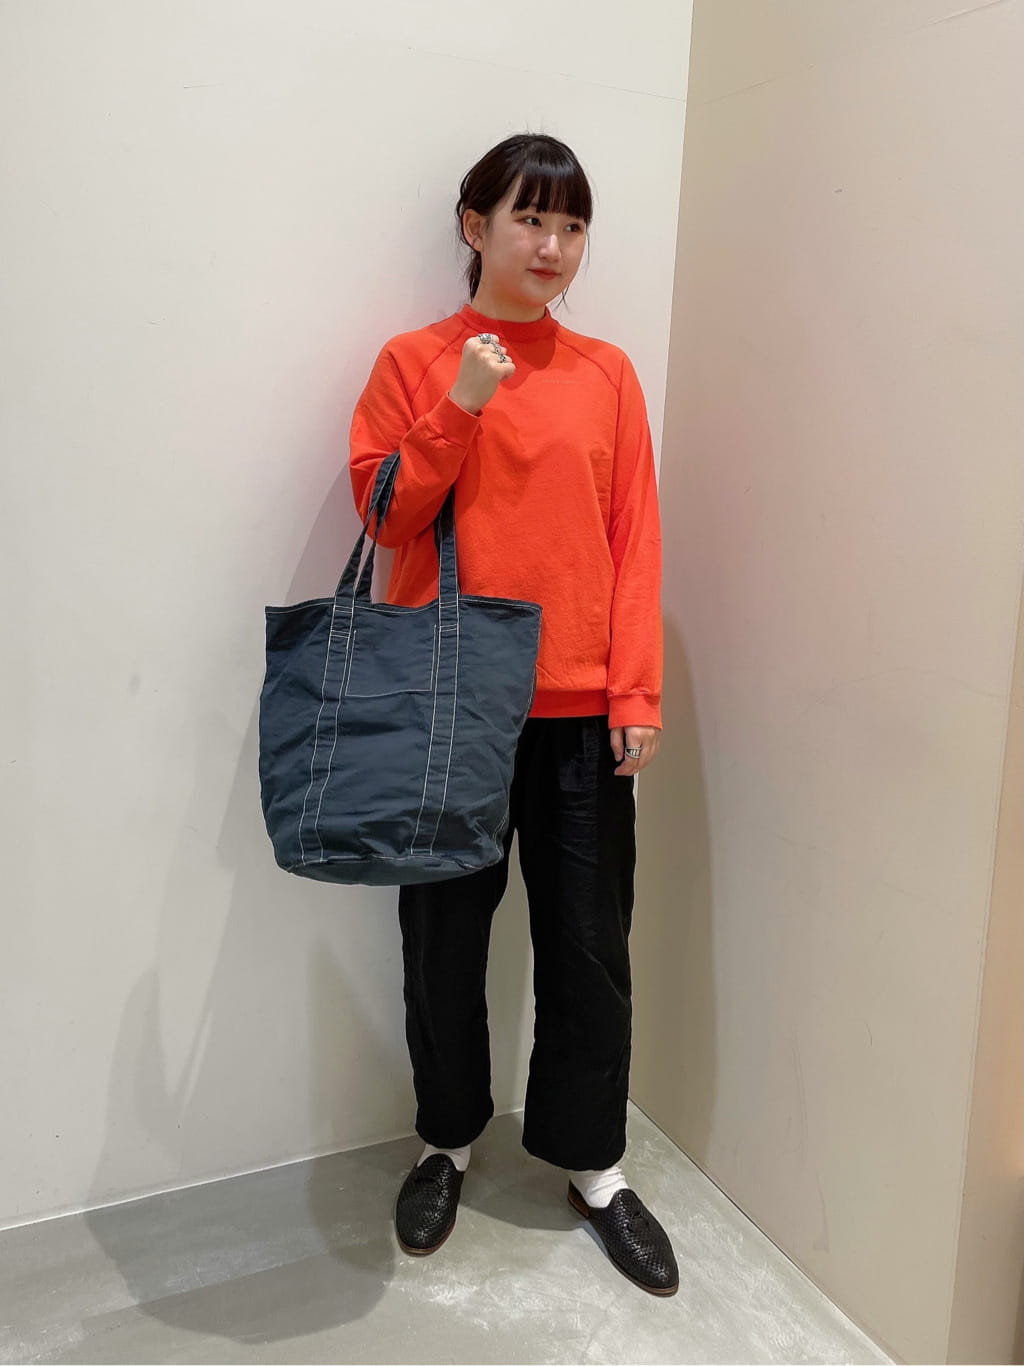 bulle de savon 阪急西宮ガーデンズ 身長:166cm 2021.08.19